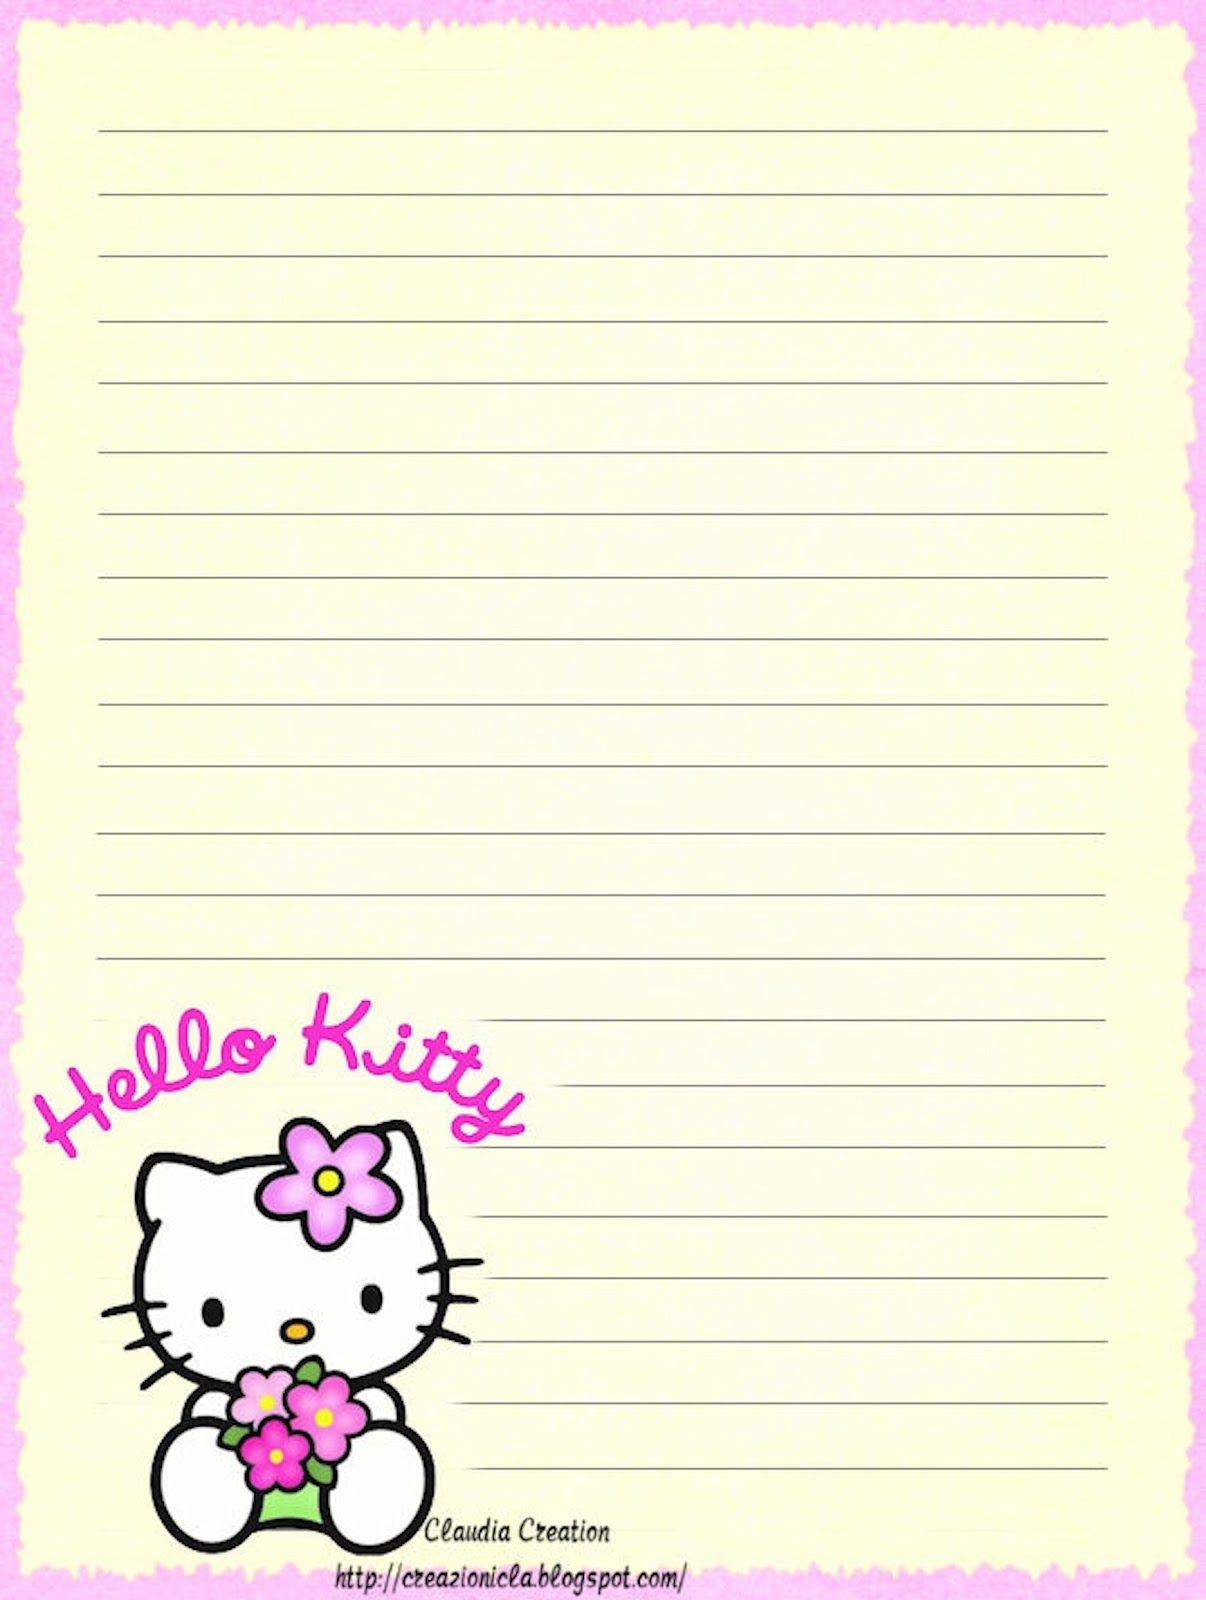 Hello Kitty | Borders,stationary,backgrounds | Hello Kitty Wallpaper - Free Printable Hello Kitty Stationery